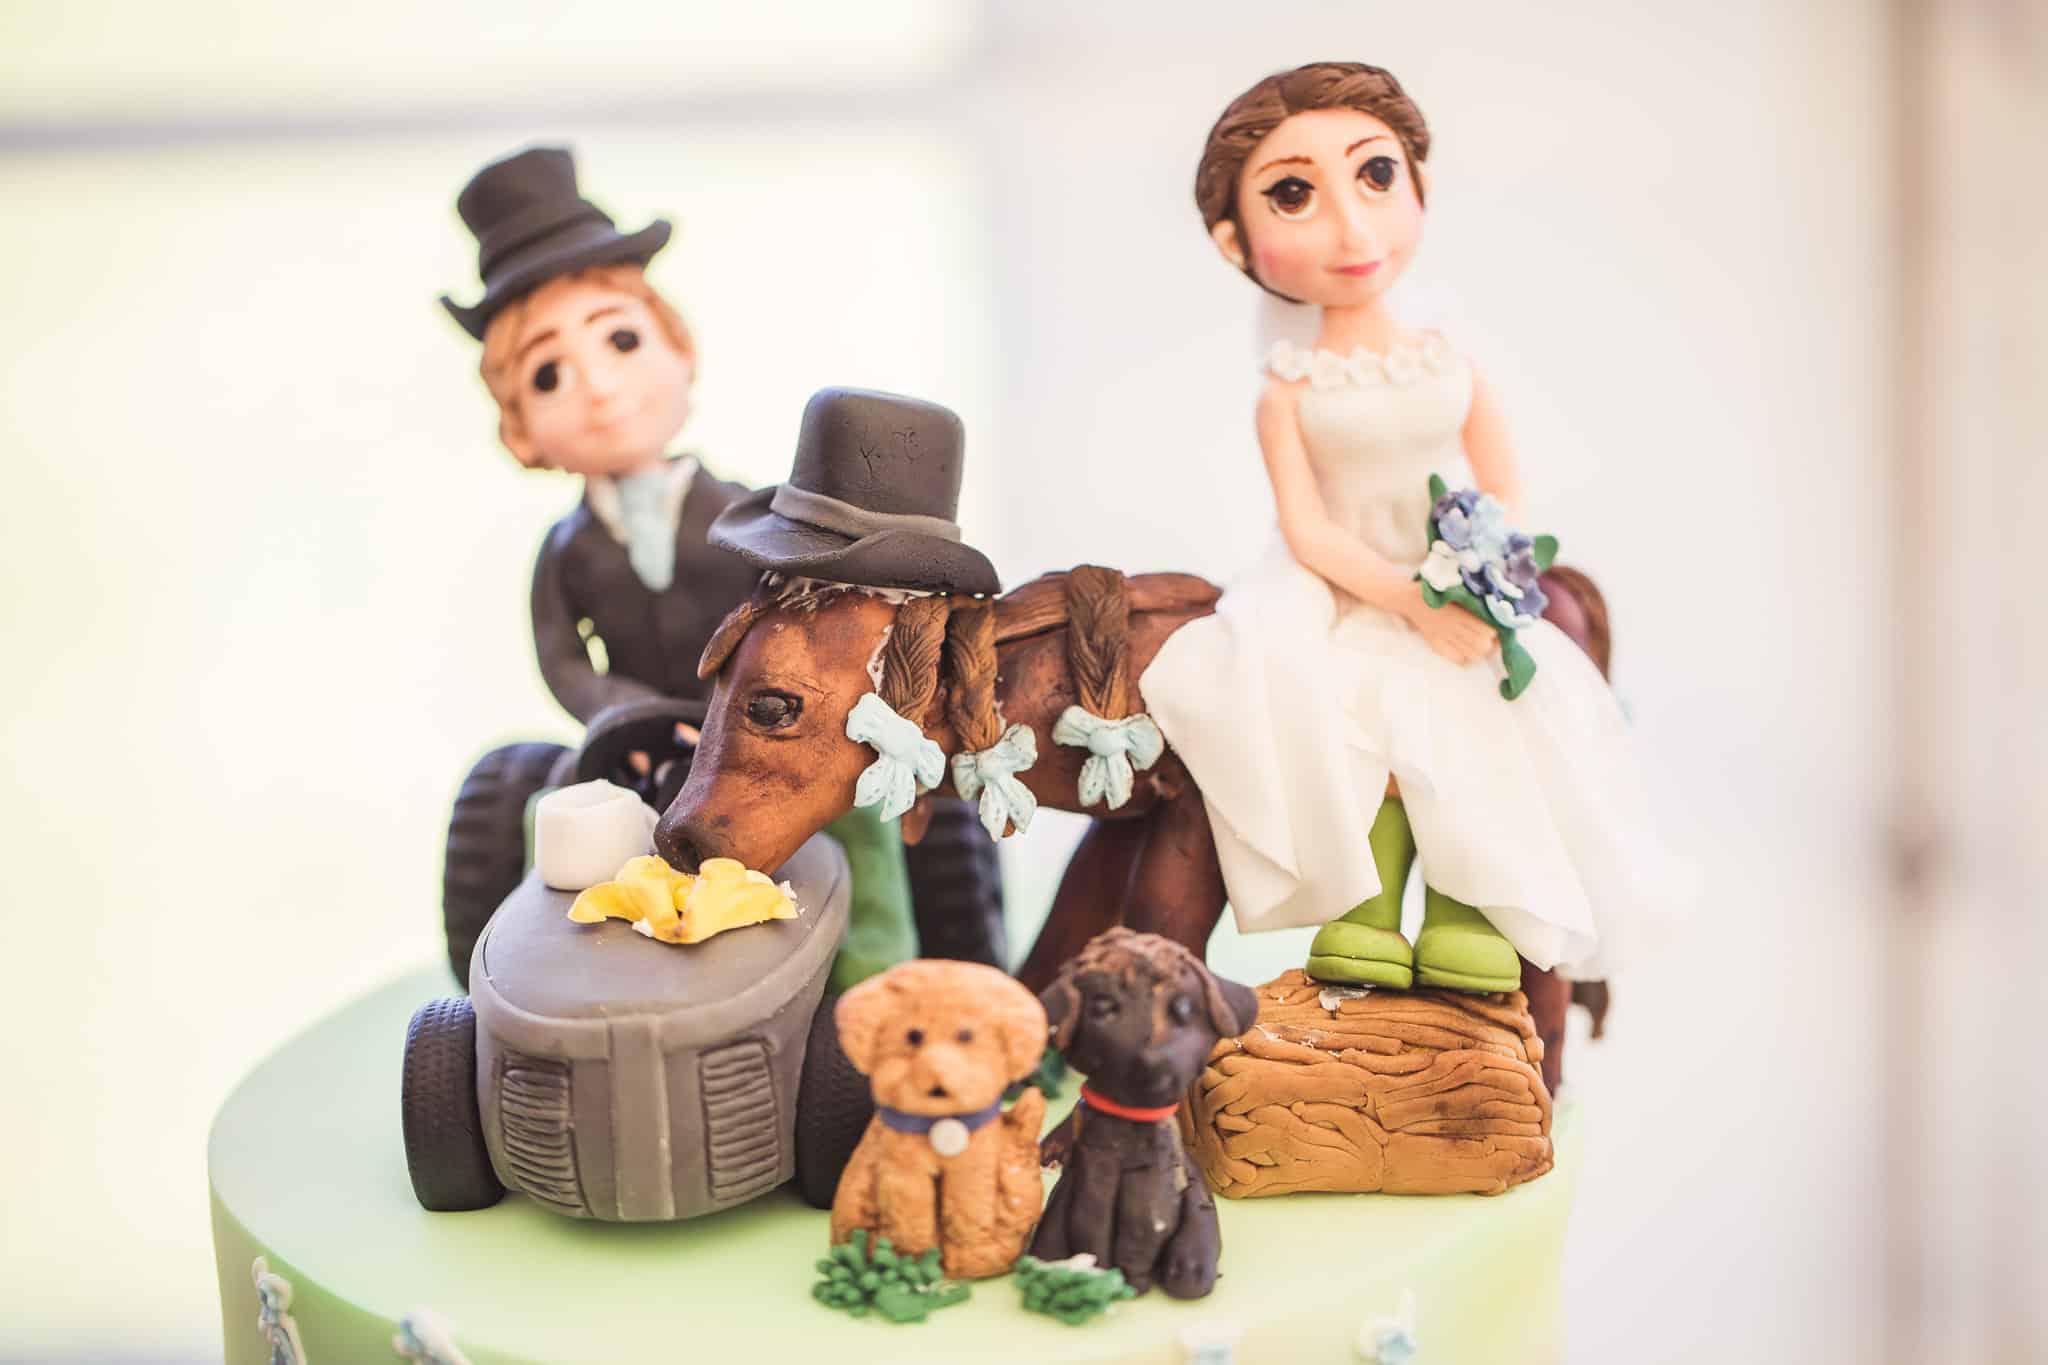 Catherine-George-Wedding-Cannington-Bridgwater-Somerset-Katie-Mortimore-Photography-small-255